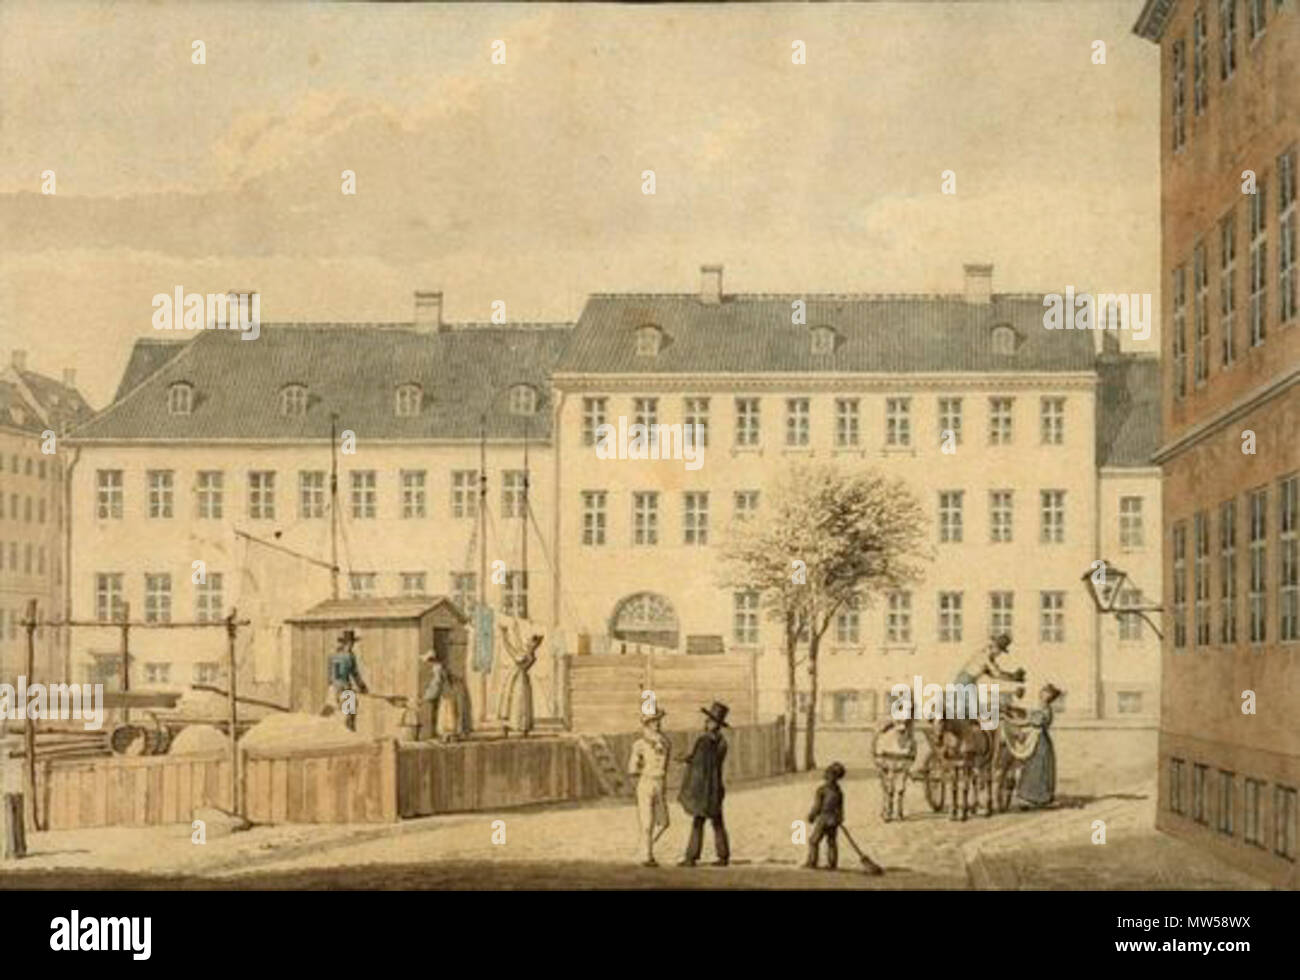 . Sandkiste (sand deposit?) - at Frederiksholms Kanal in Copenhagen, Denmark . 1835. G. F. Holm 262 H. G. F. Holm - Frederiksholms Kanal, 1835 - Stock Image